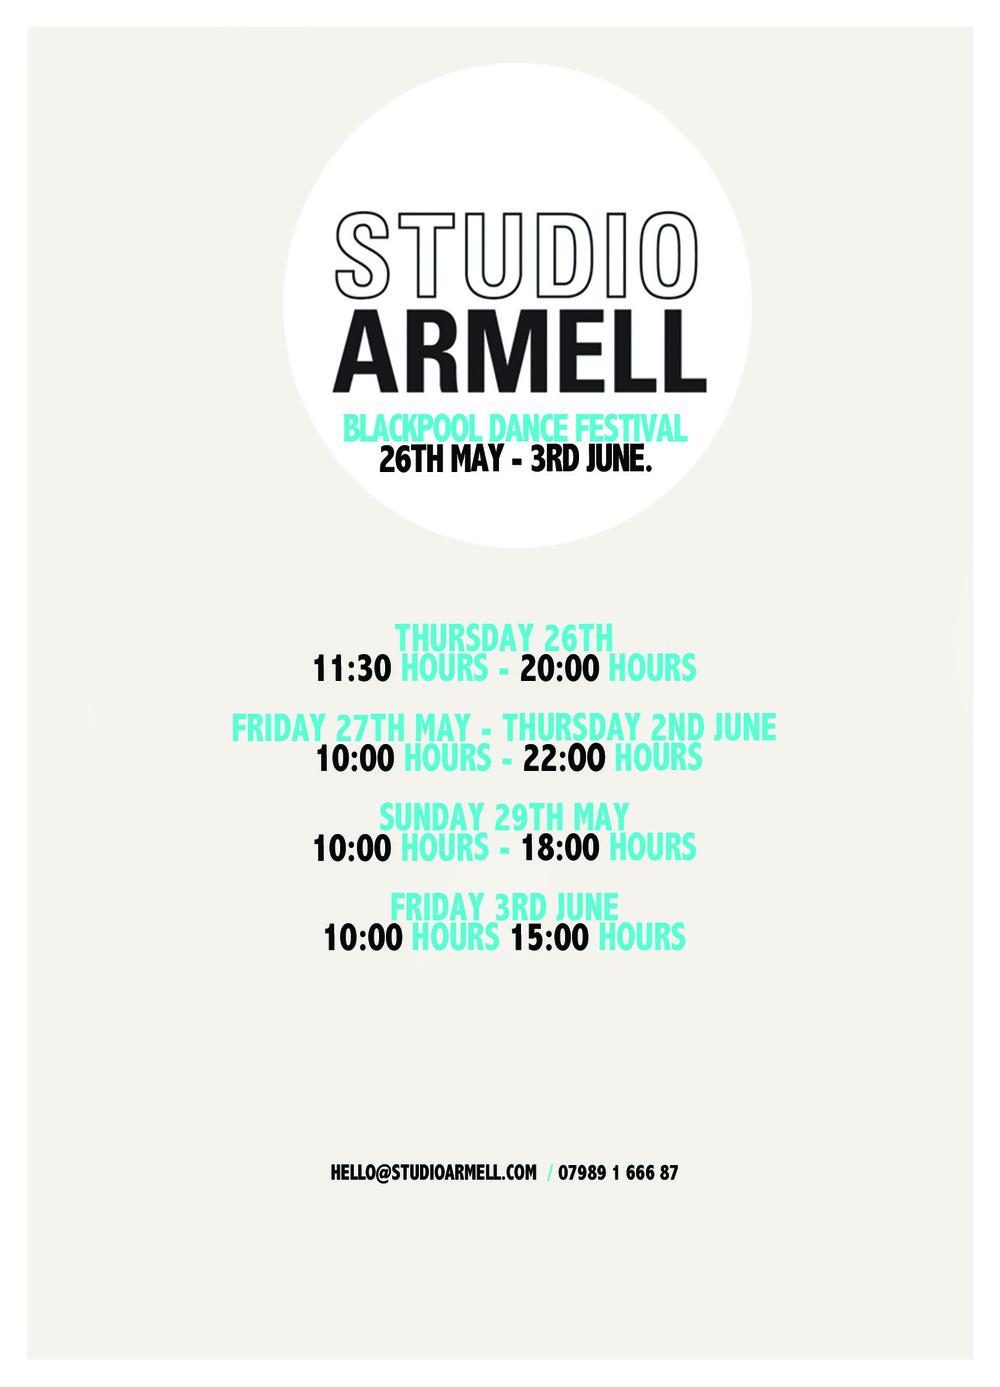 blackpool dance festival exhibition 2016 studio armell